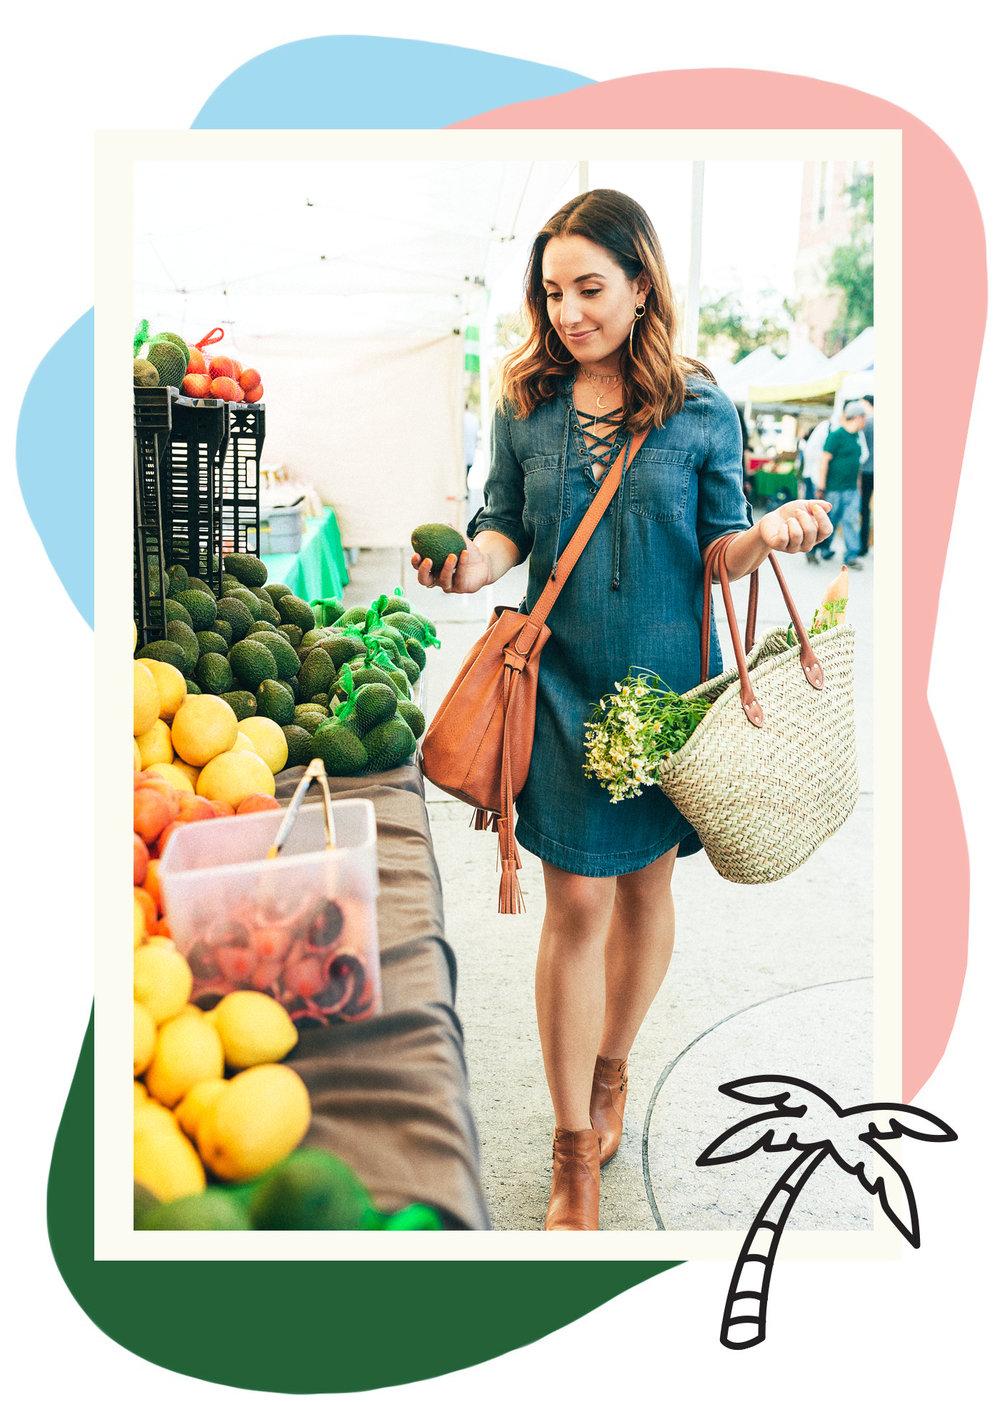 13843974-c5f9-45ad-b40f-f436635f7ecc-cali-avocado-farmersmarket.jpg